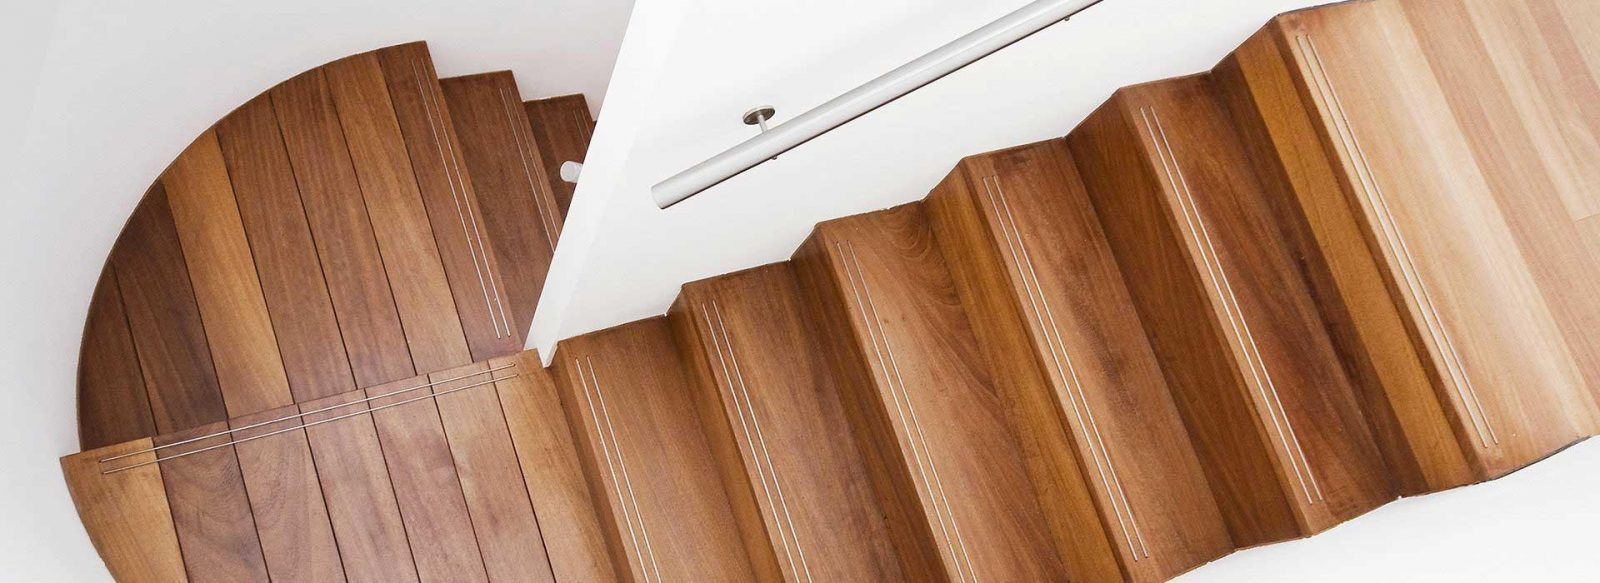 Interior Design: 8 Treppen einer anderen Ebene - Italian Design ...